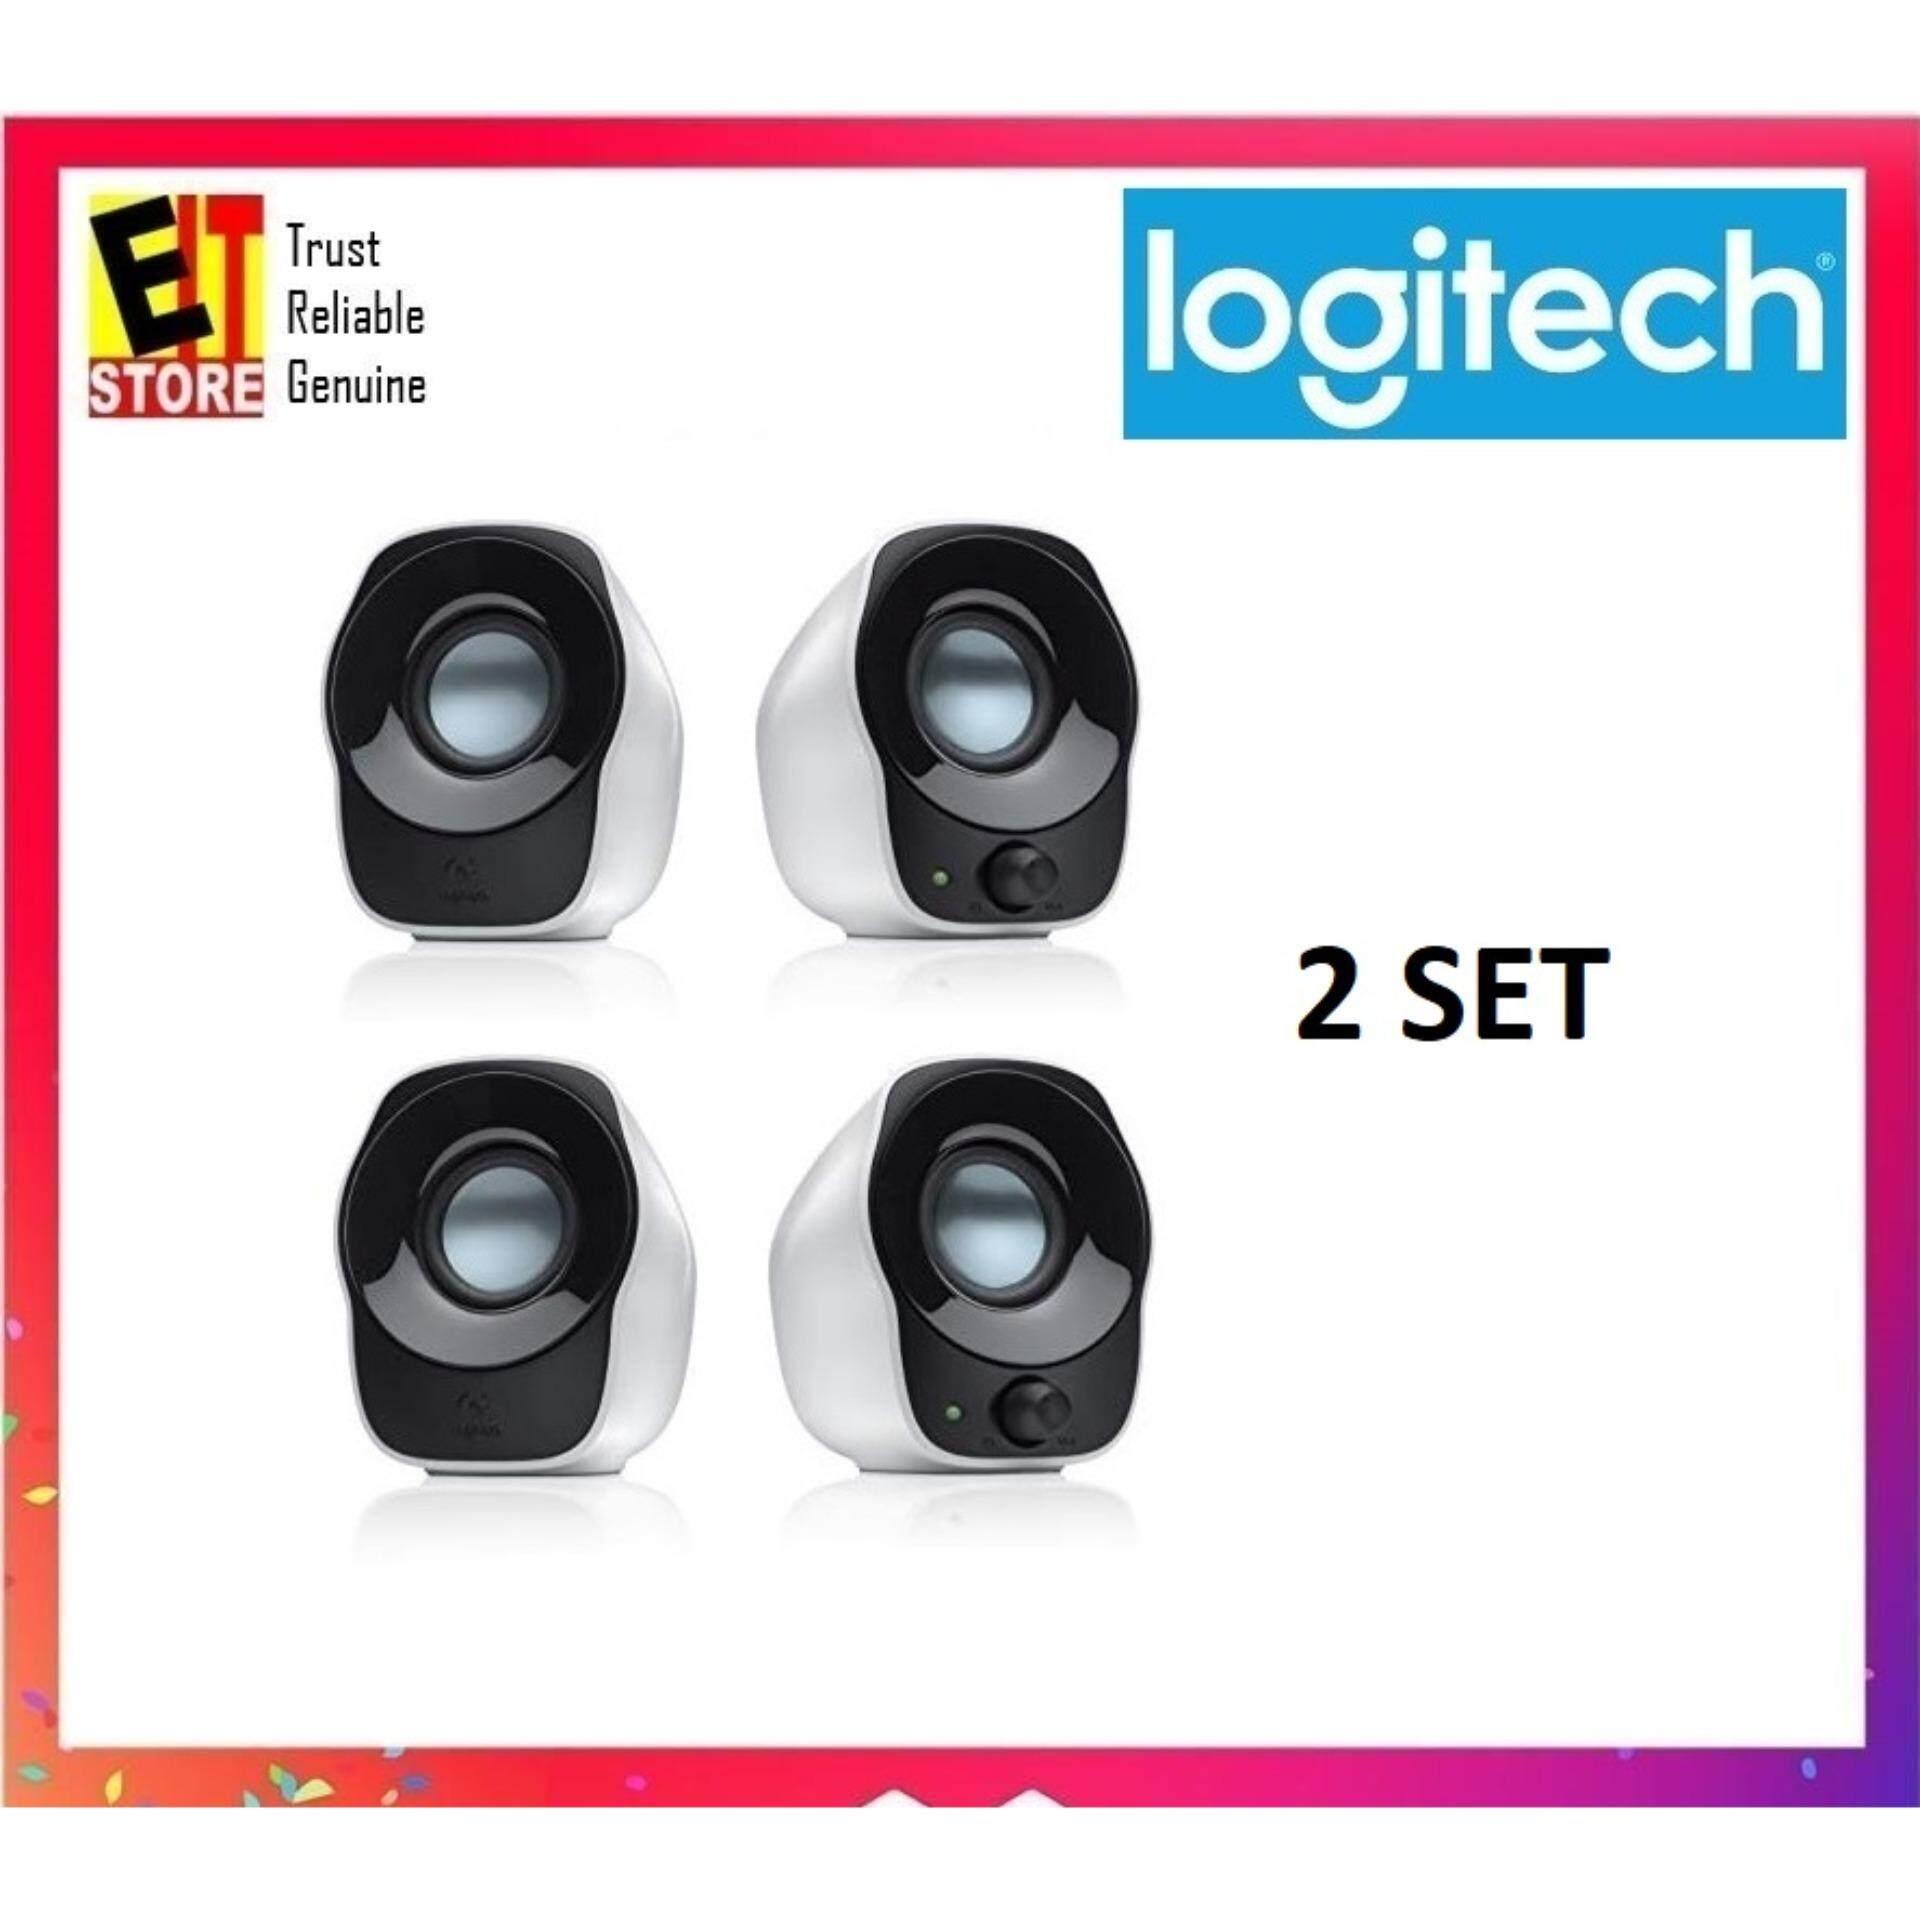 2UNIT X Logitech Z120 Stereo Speaker Malaysia